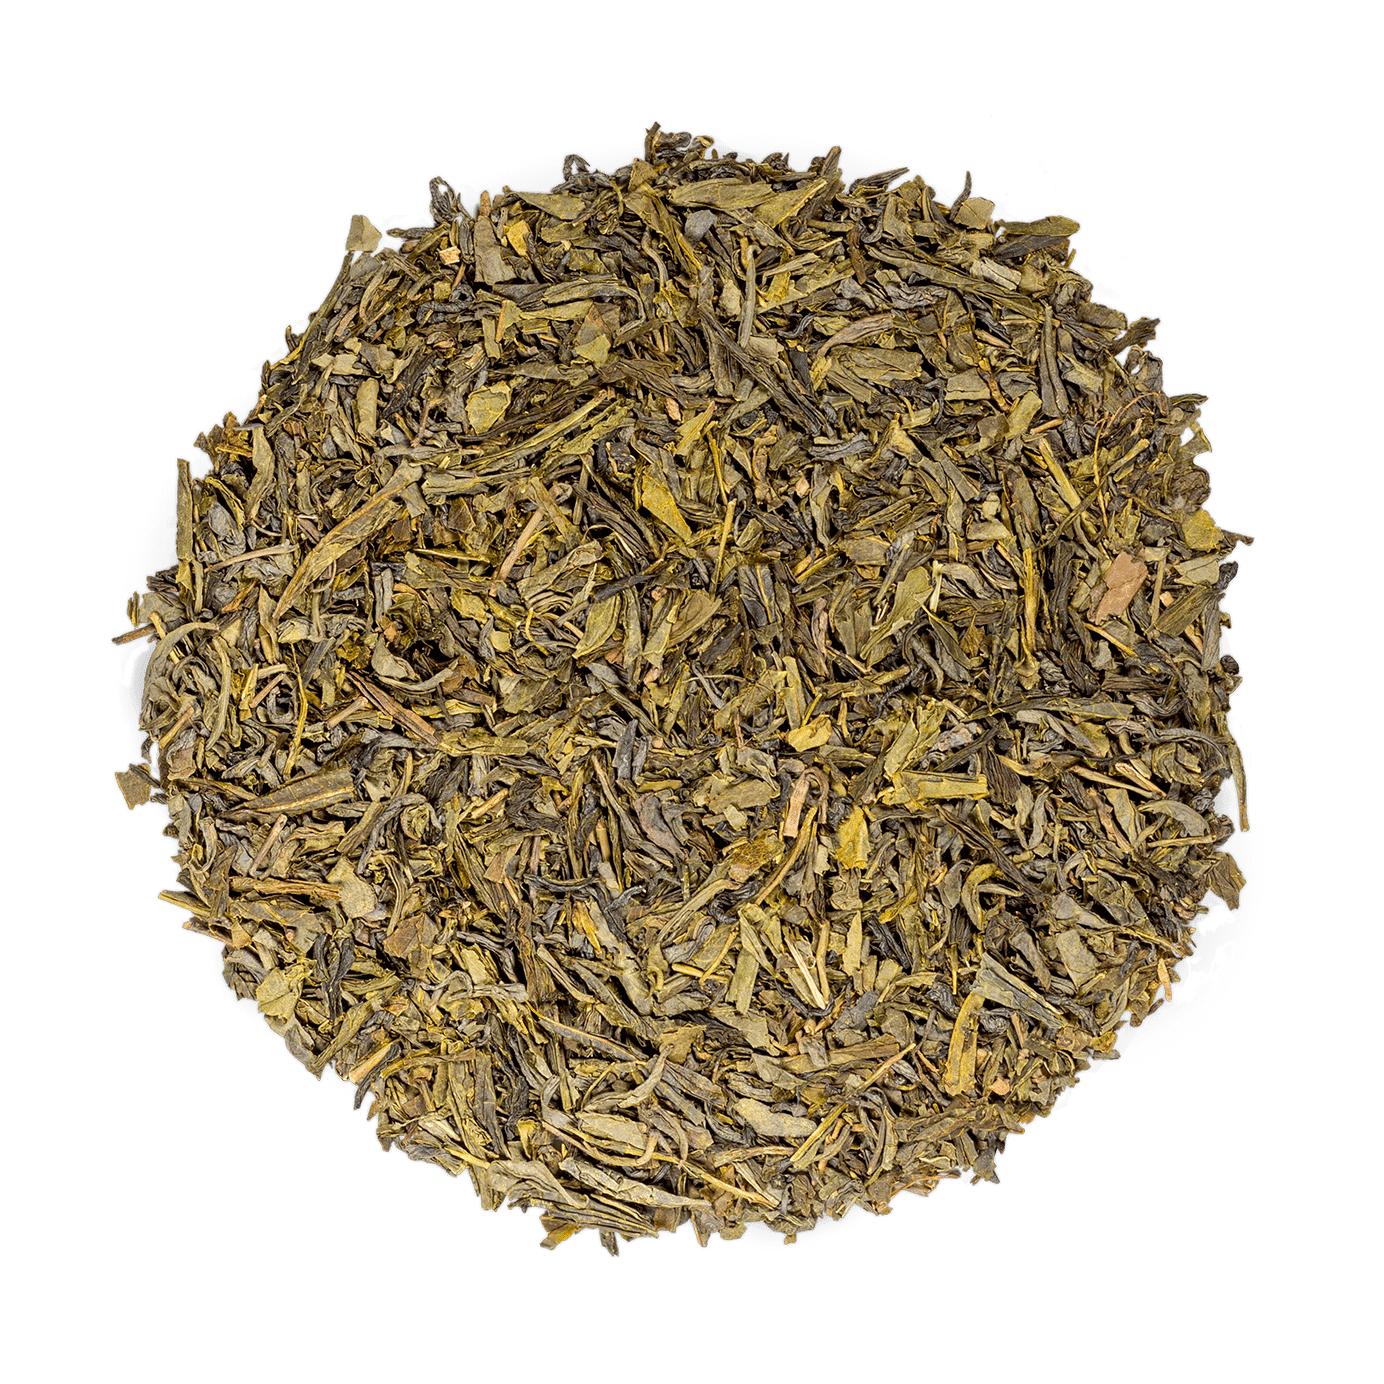 KUSMI TEA Vert rose bio - Thé vert à la rose - Thé en vrac - Kusmi Tea